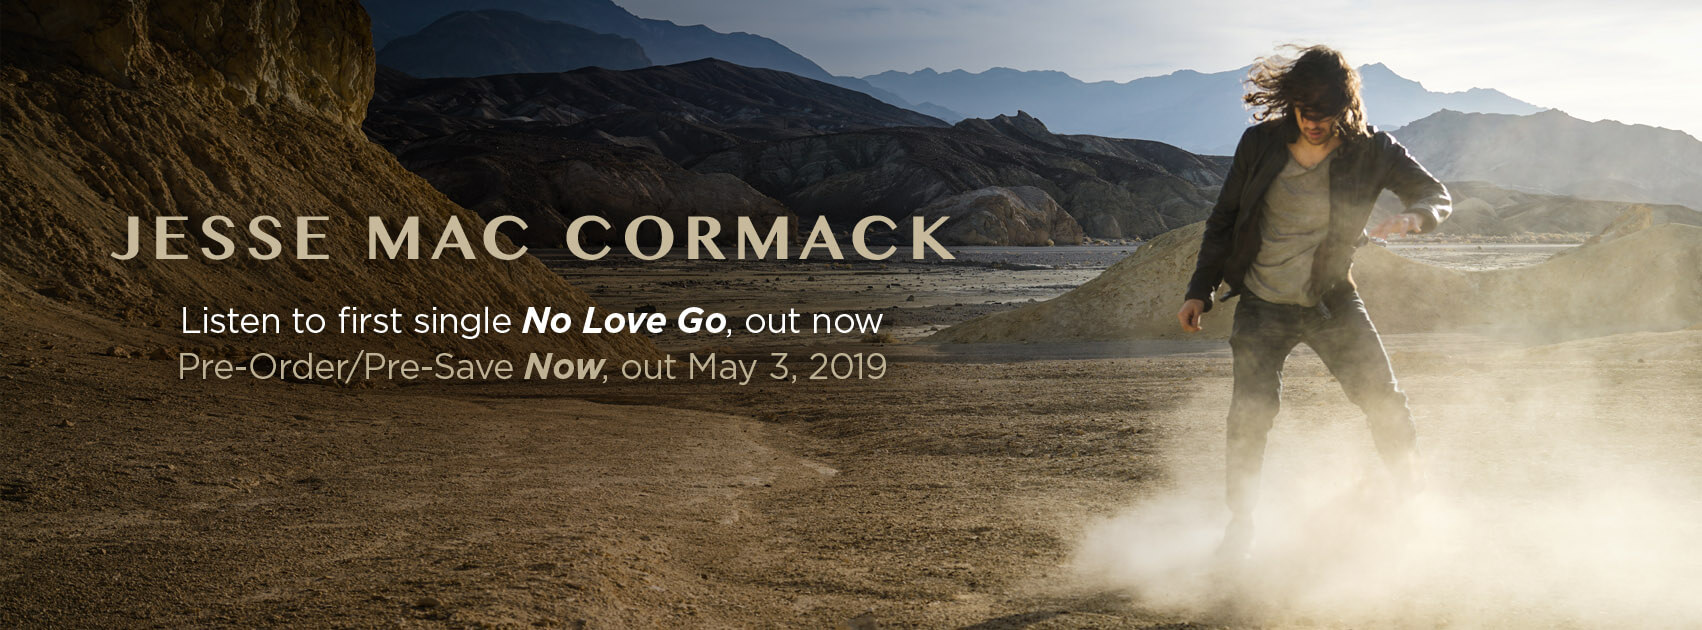 Jesse Mac Cormack - no love go - now